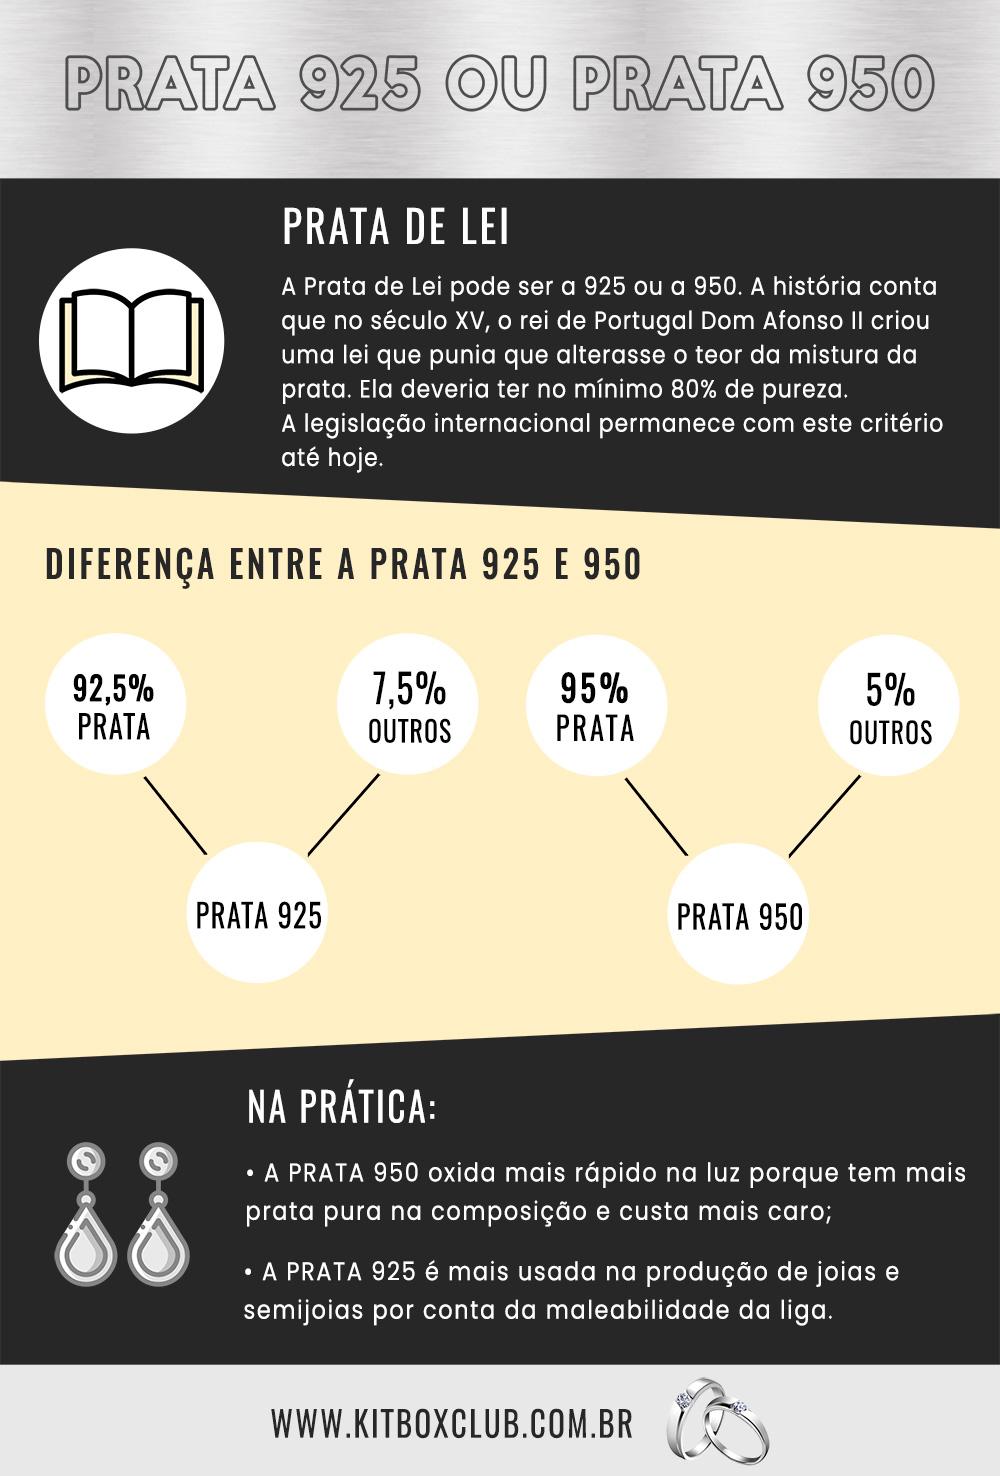 Infográfico Prata 925 Prata 950 Prata de Lei